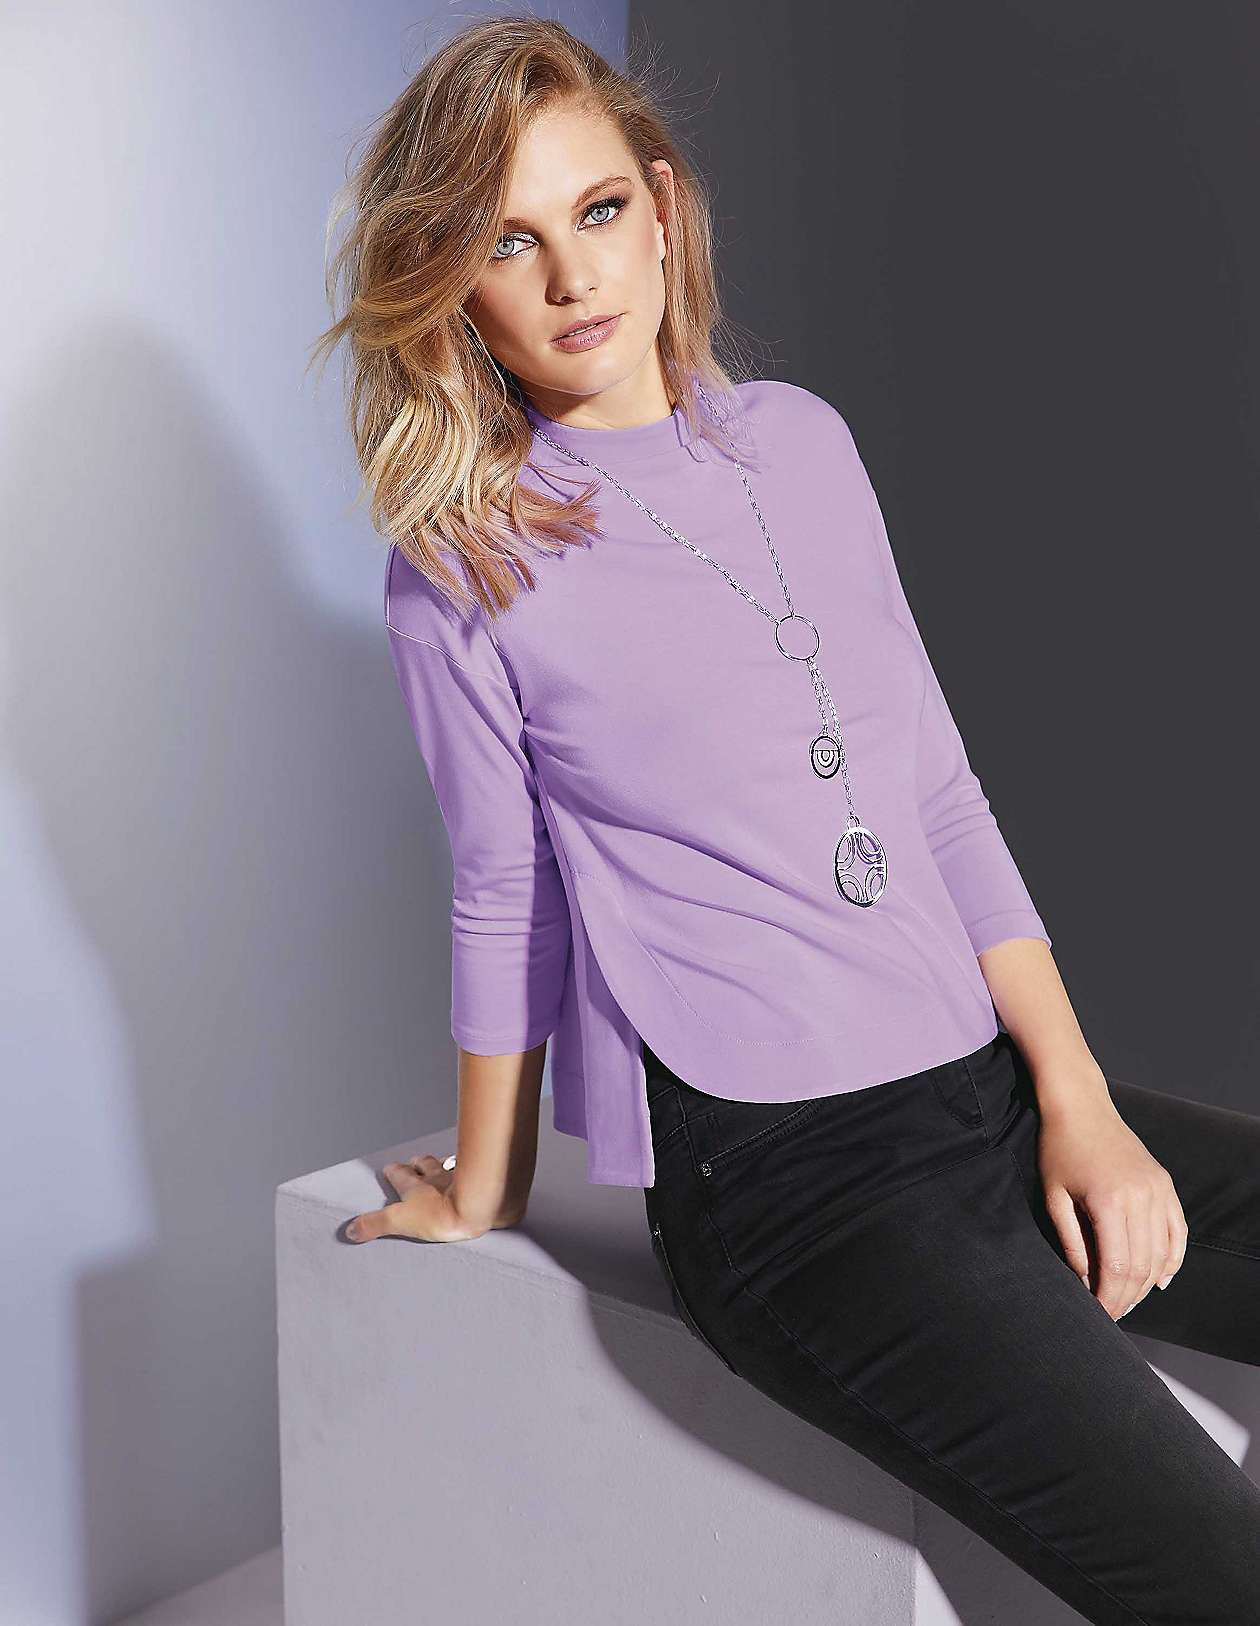 cf98df5e3c7de9 Damen-Shirts und Tops- exklusiv, edel, extravagant, elegant | MADELEINE Mode